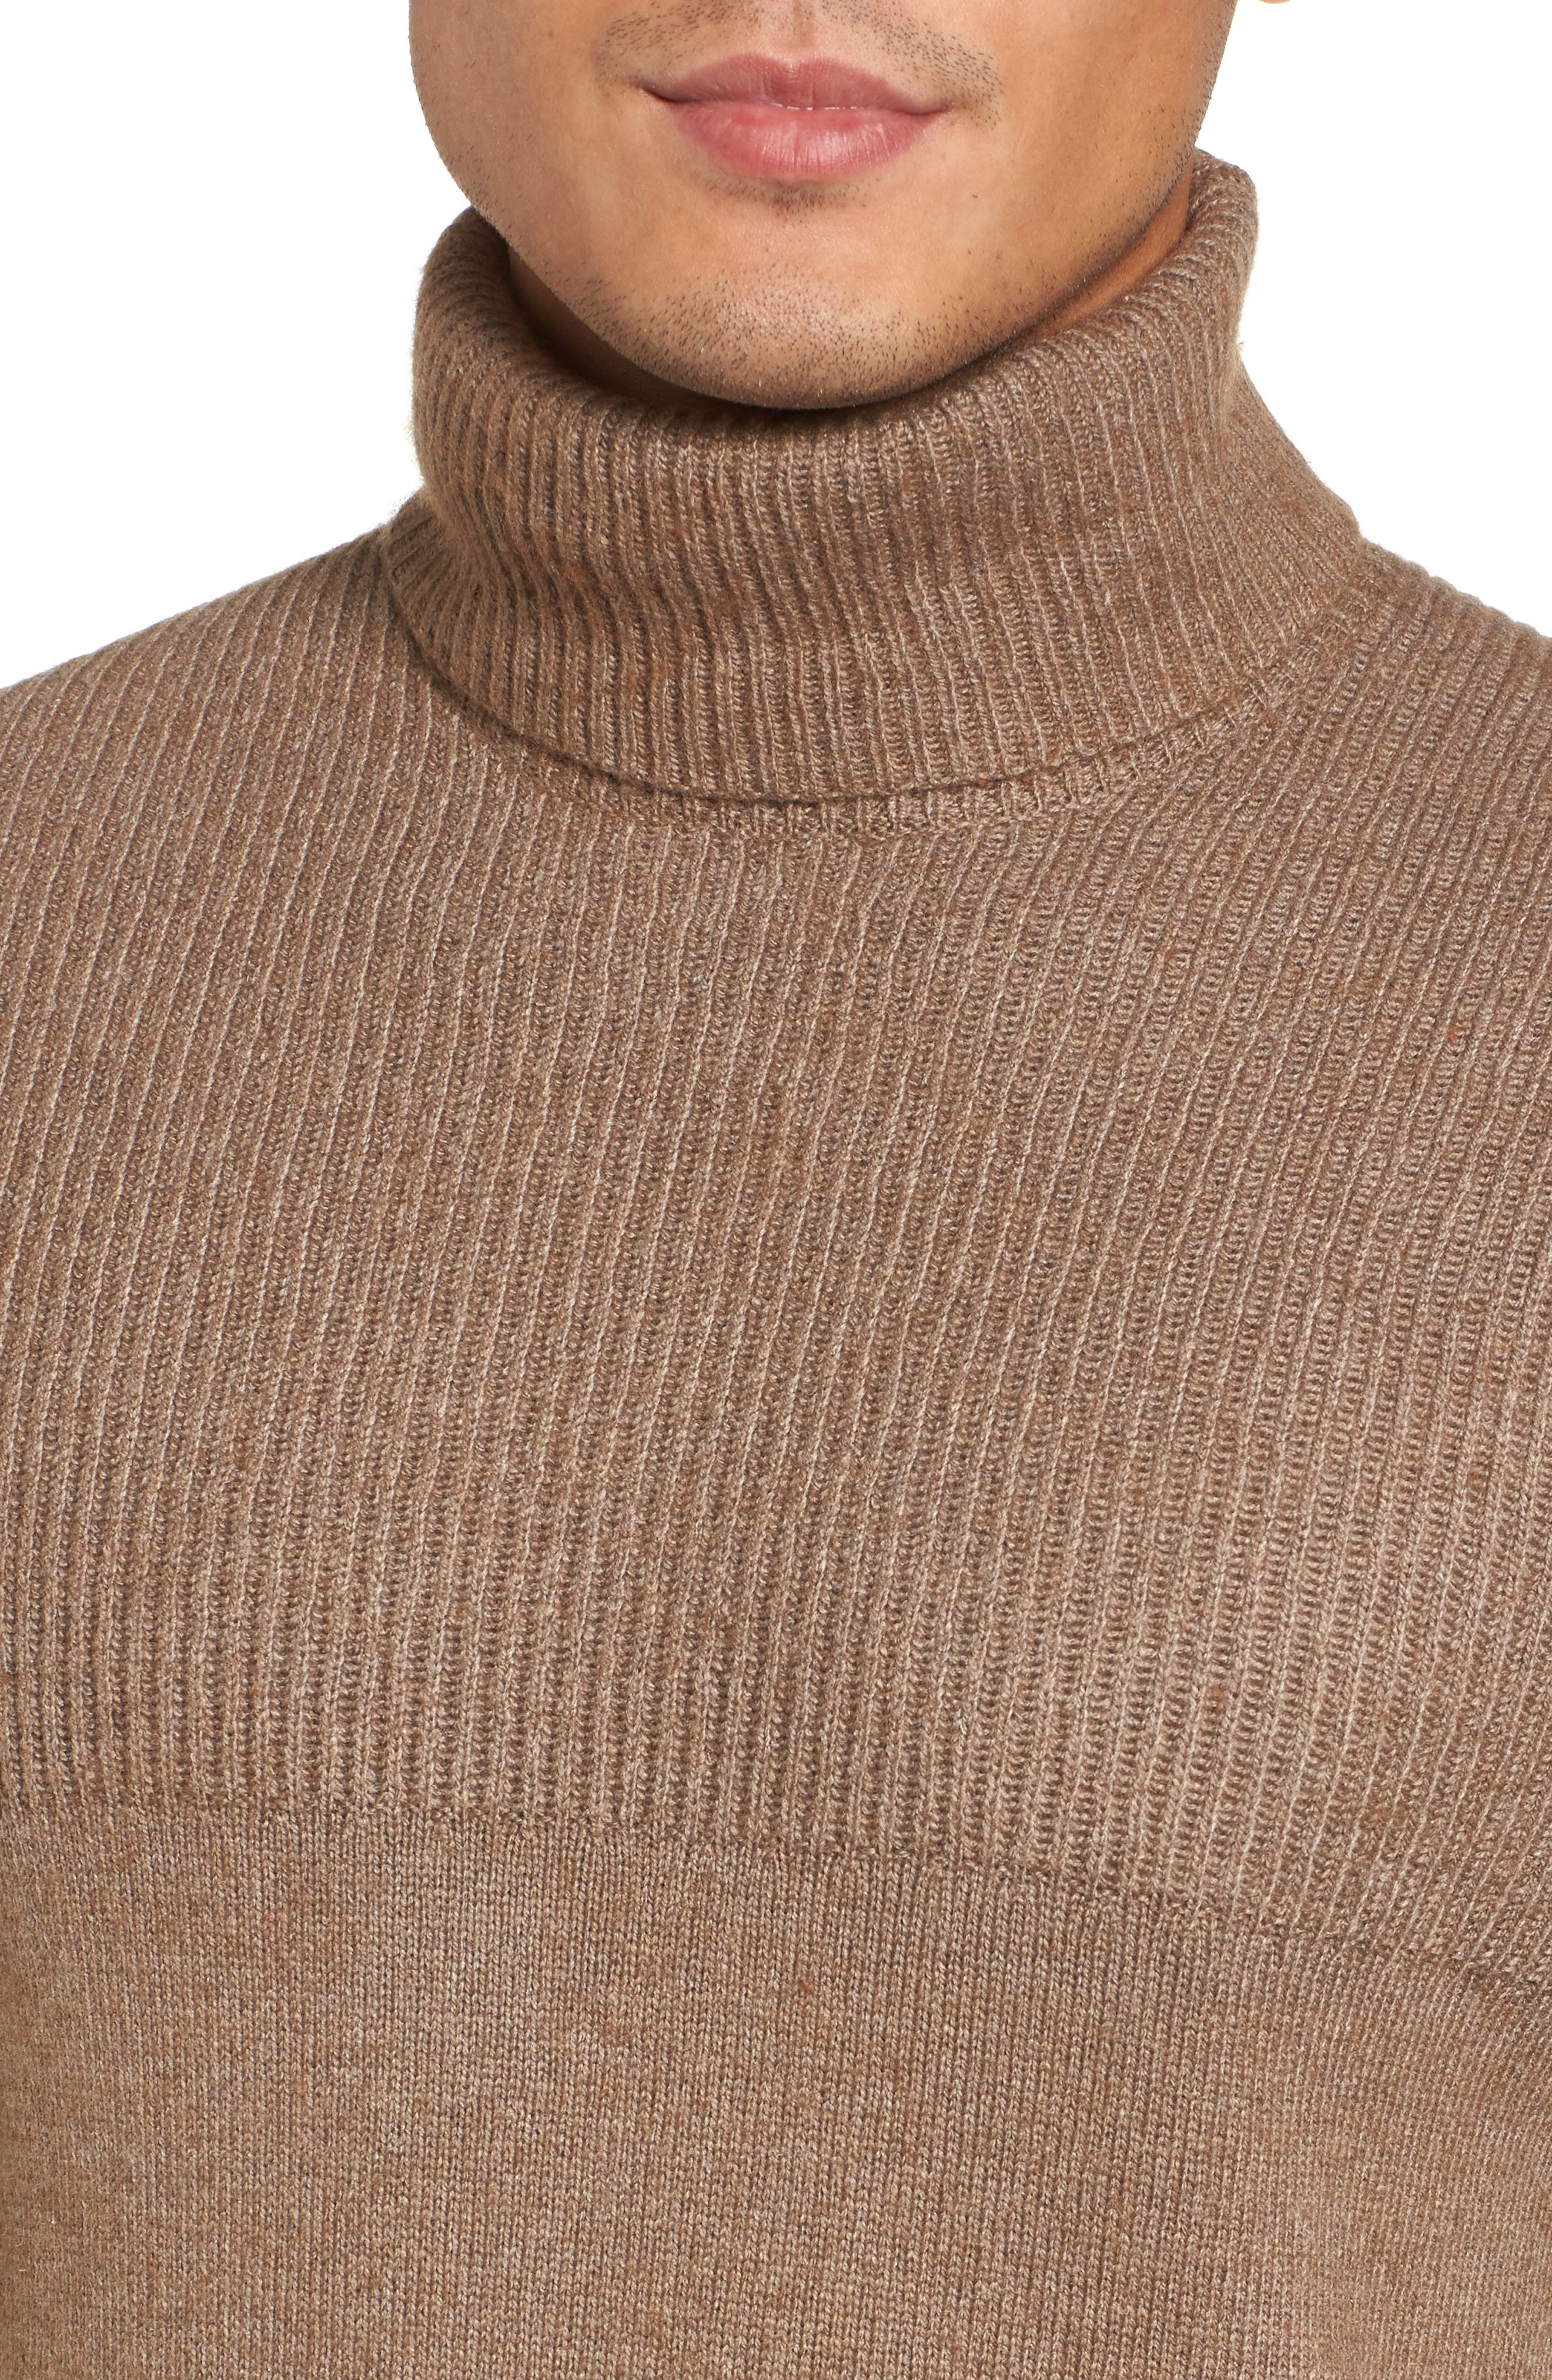 Mix Stitch Turtleneck Sweater,                             Alternate thumbnail 4, color,                             261